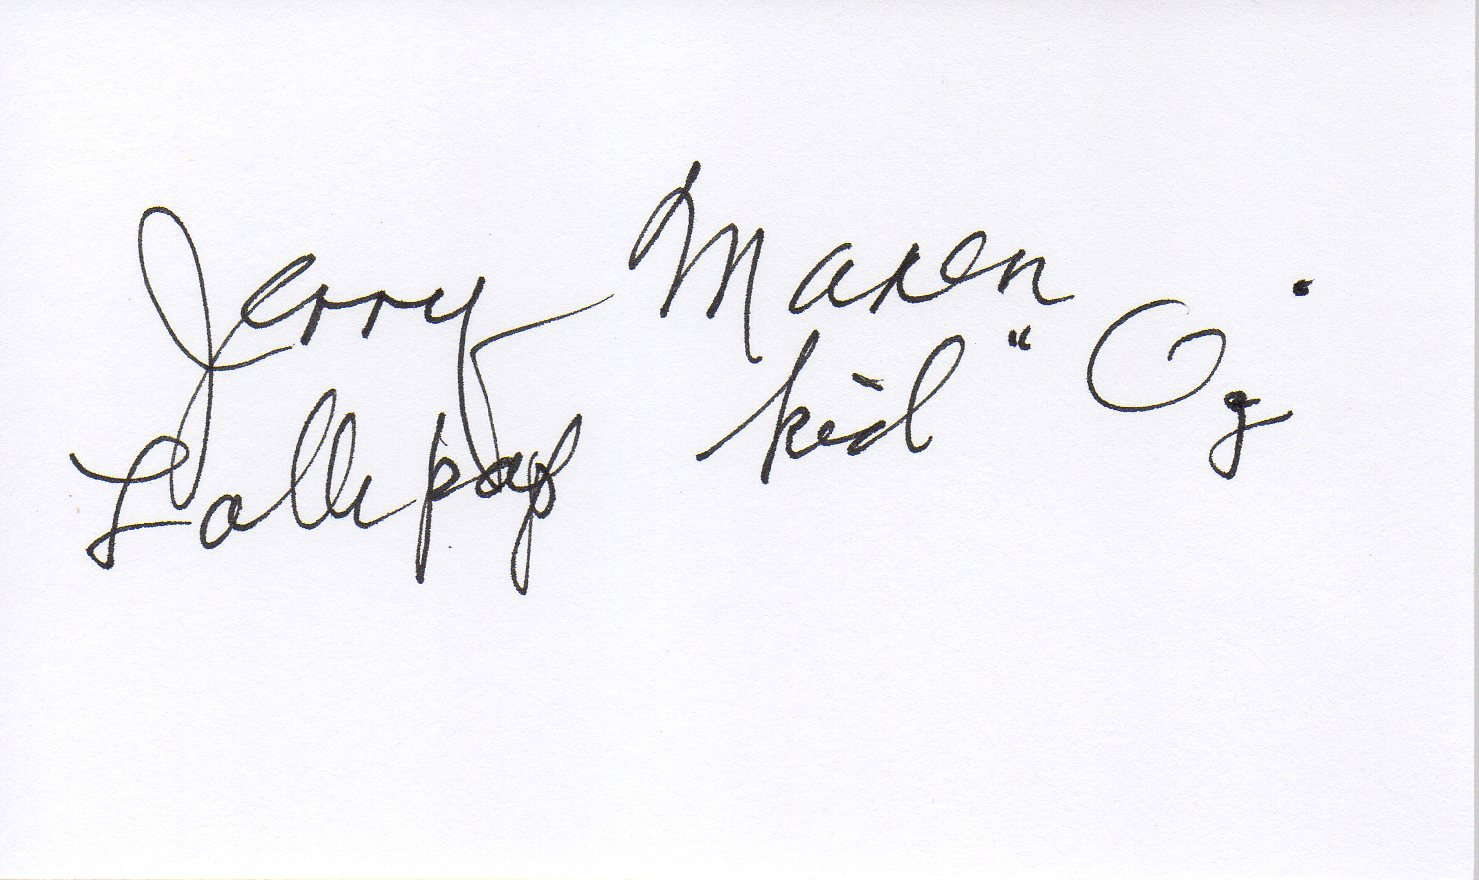 Jerry Maren hand signed 3x5 card. Lollipop Kid Wizard Of Oz